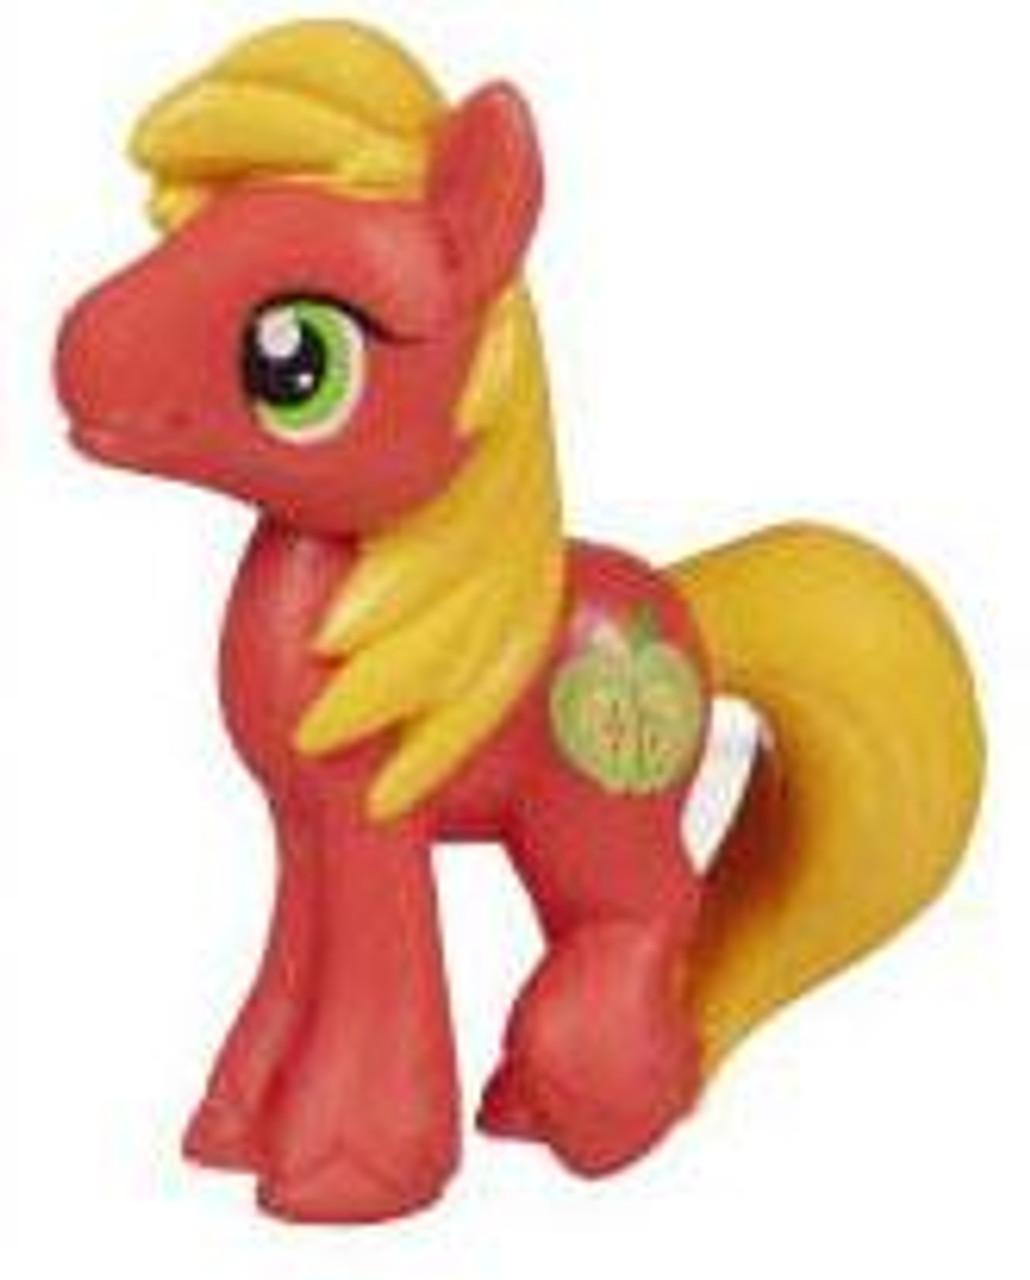 My Little Pony Friendship is Magic 2 Inch Big Macintosh PVC Figure